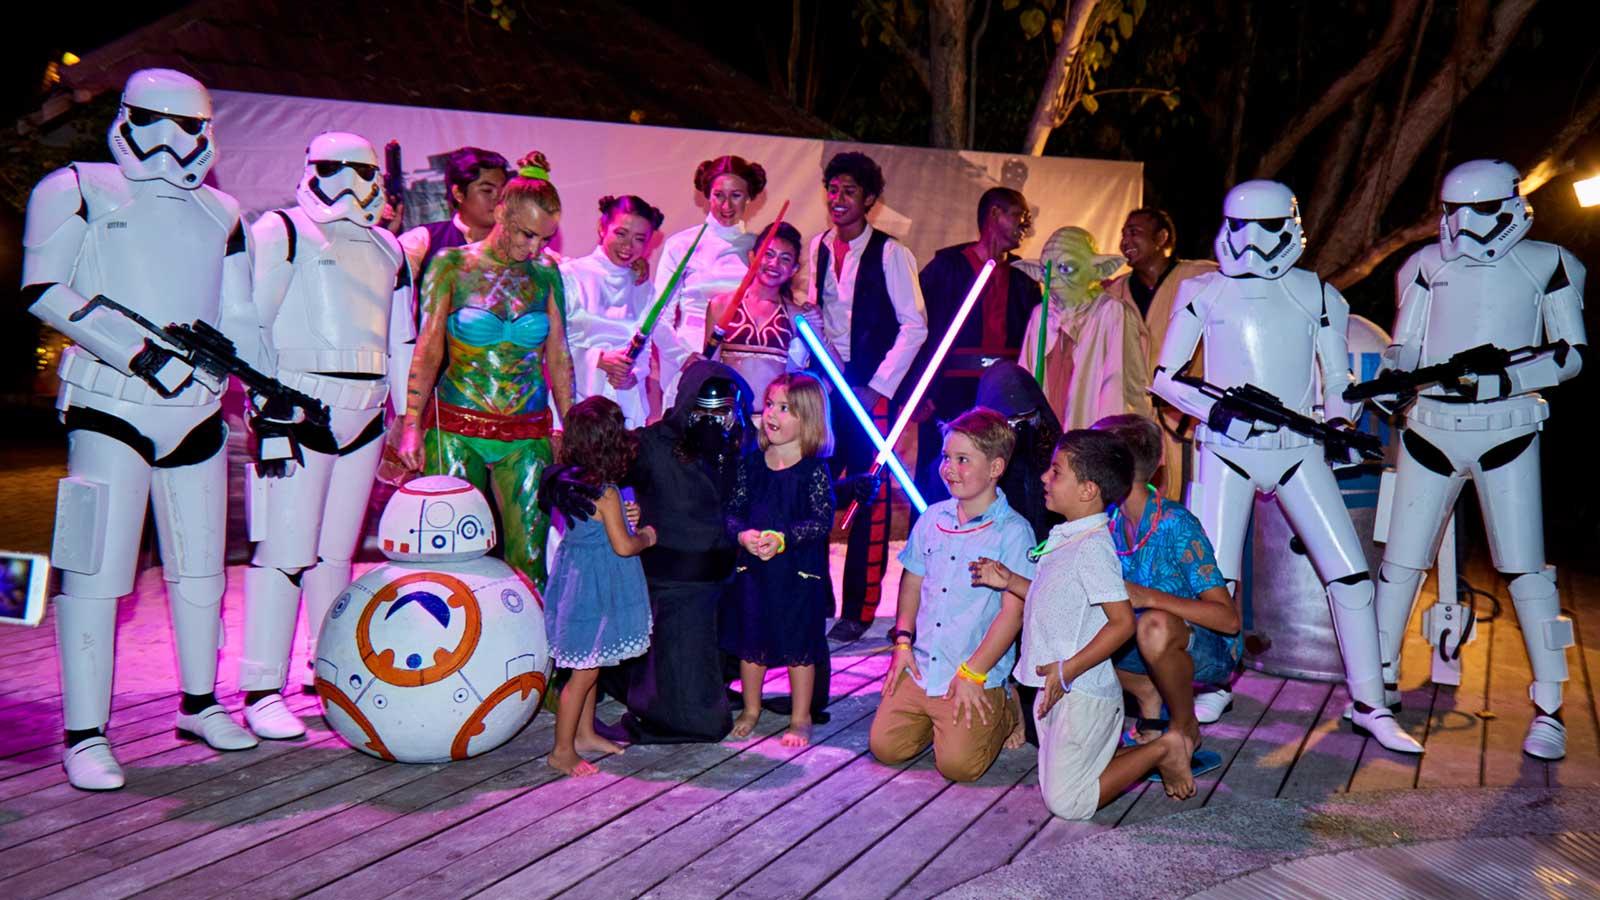 kuredu resort maldives new year s eve star wars glow party. Black Bedroom Furniture Sets. Home Design Ideas